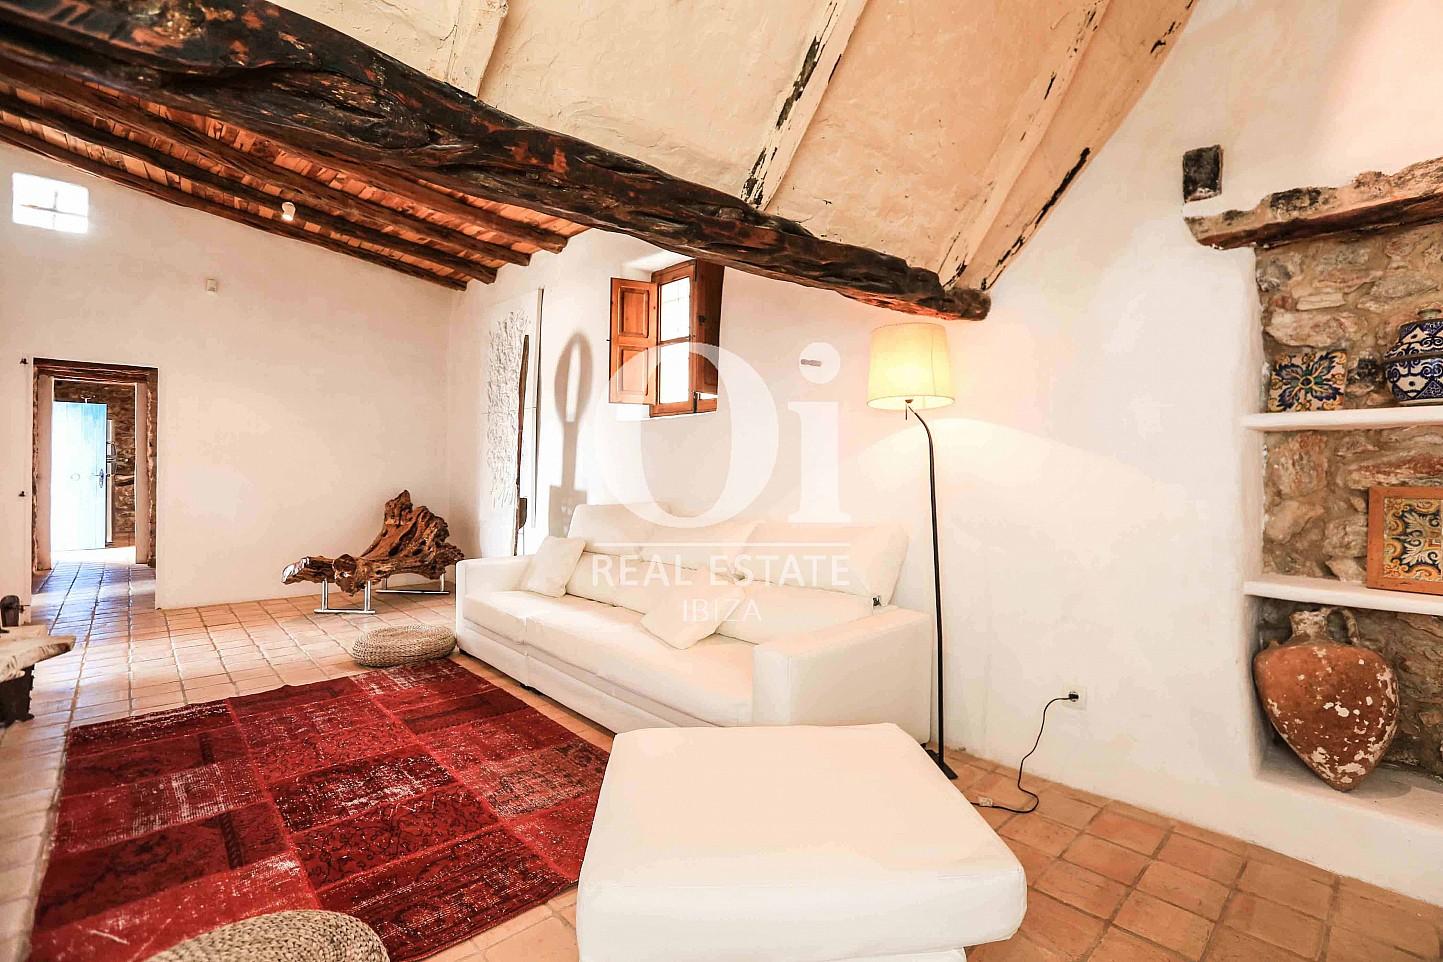 Sala de estar de casa en alquiler vacacional en zona Puig d'en Valls, Ibiza